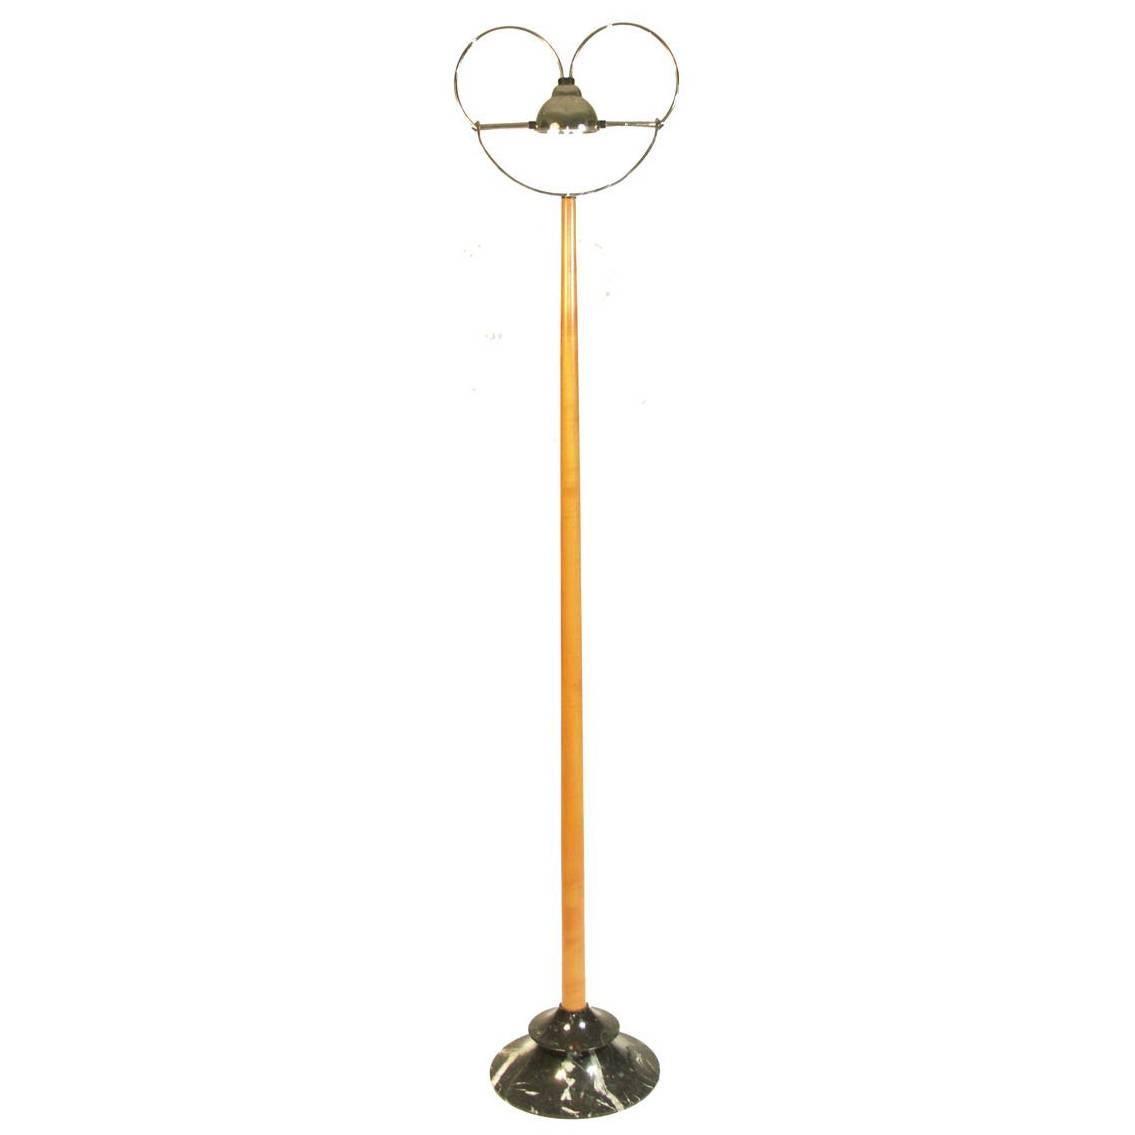 Matteo Thun & Woka Art Collection Floor Lamp - relaunched